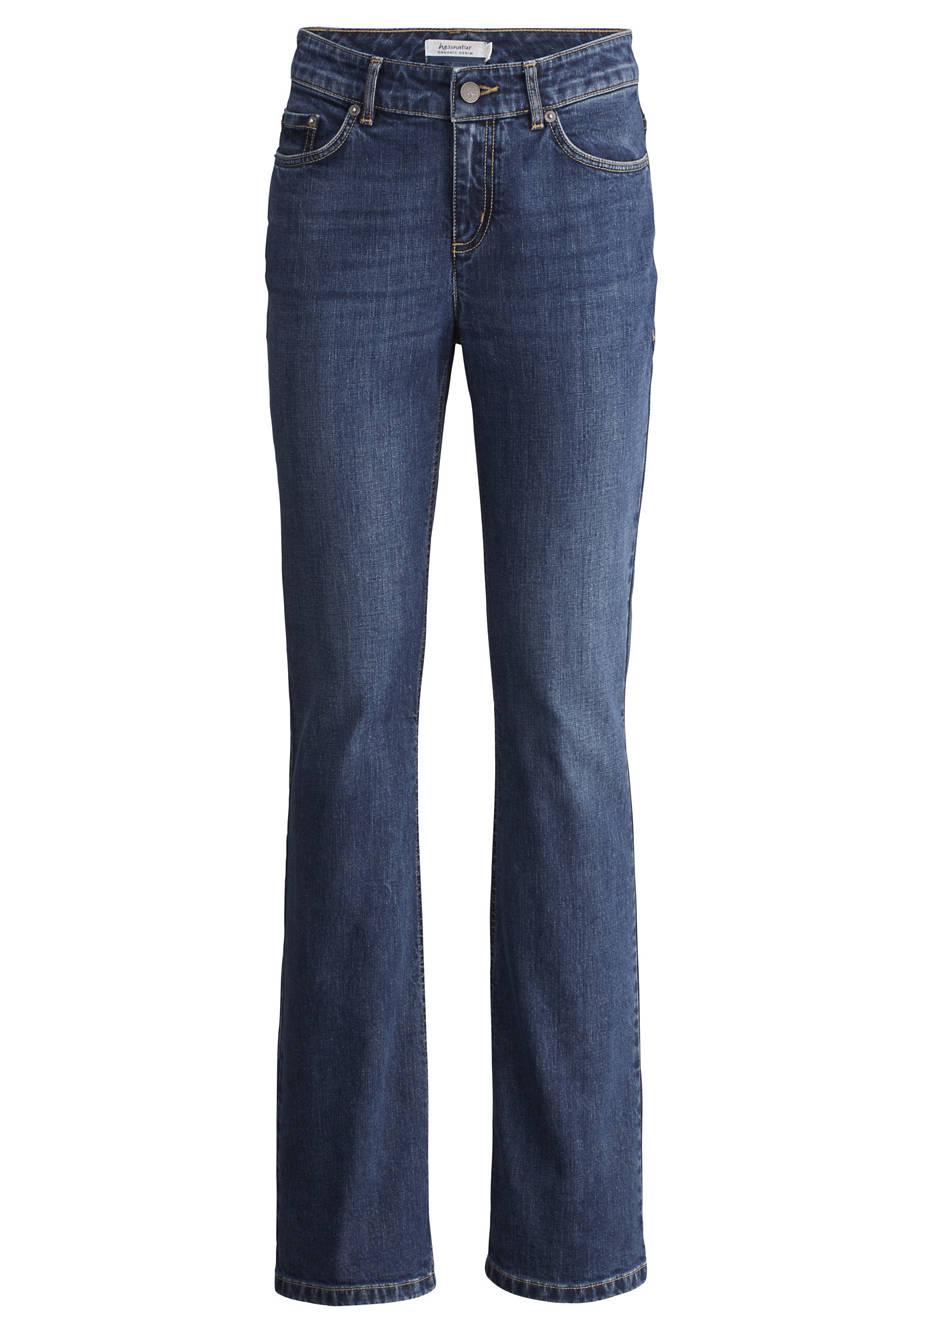 Bootcut jeans made of organic denim